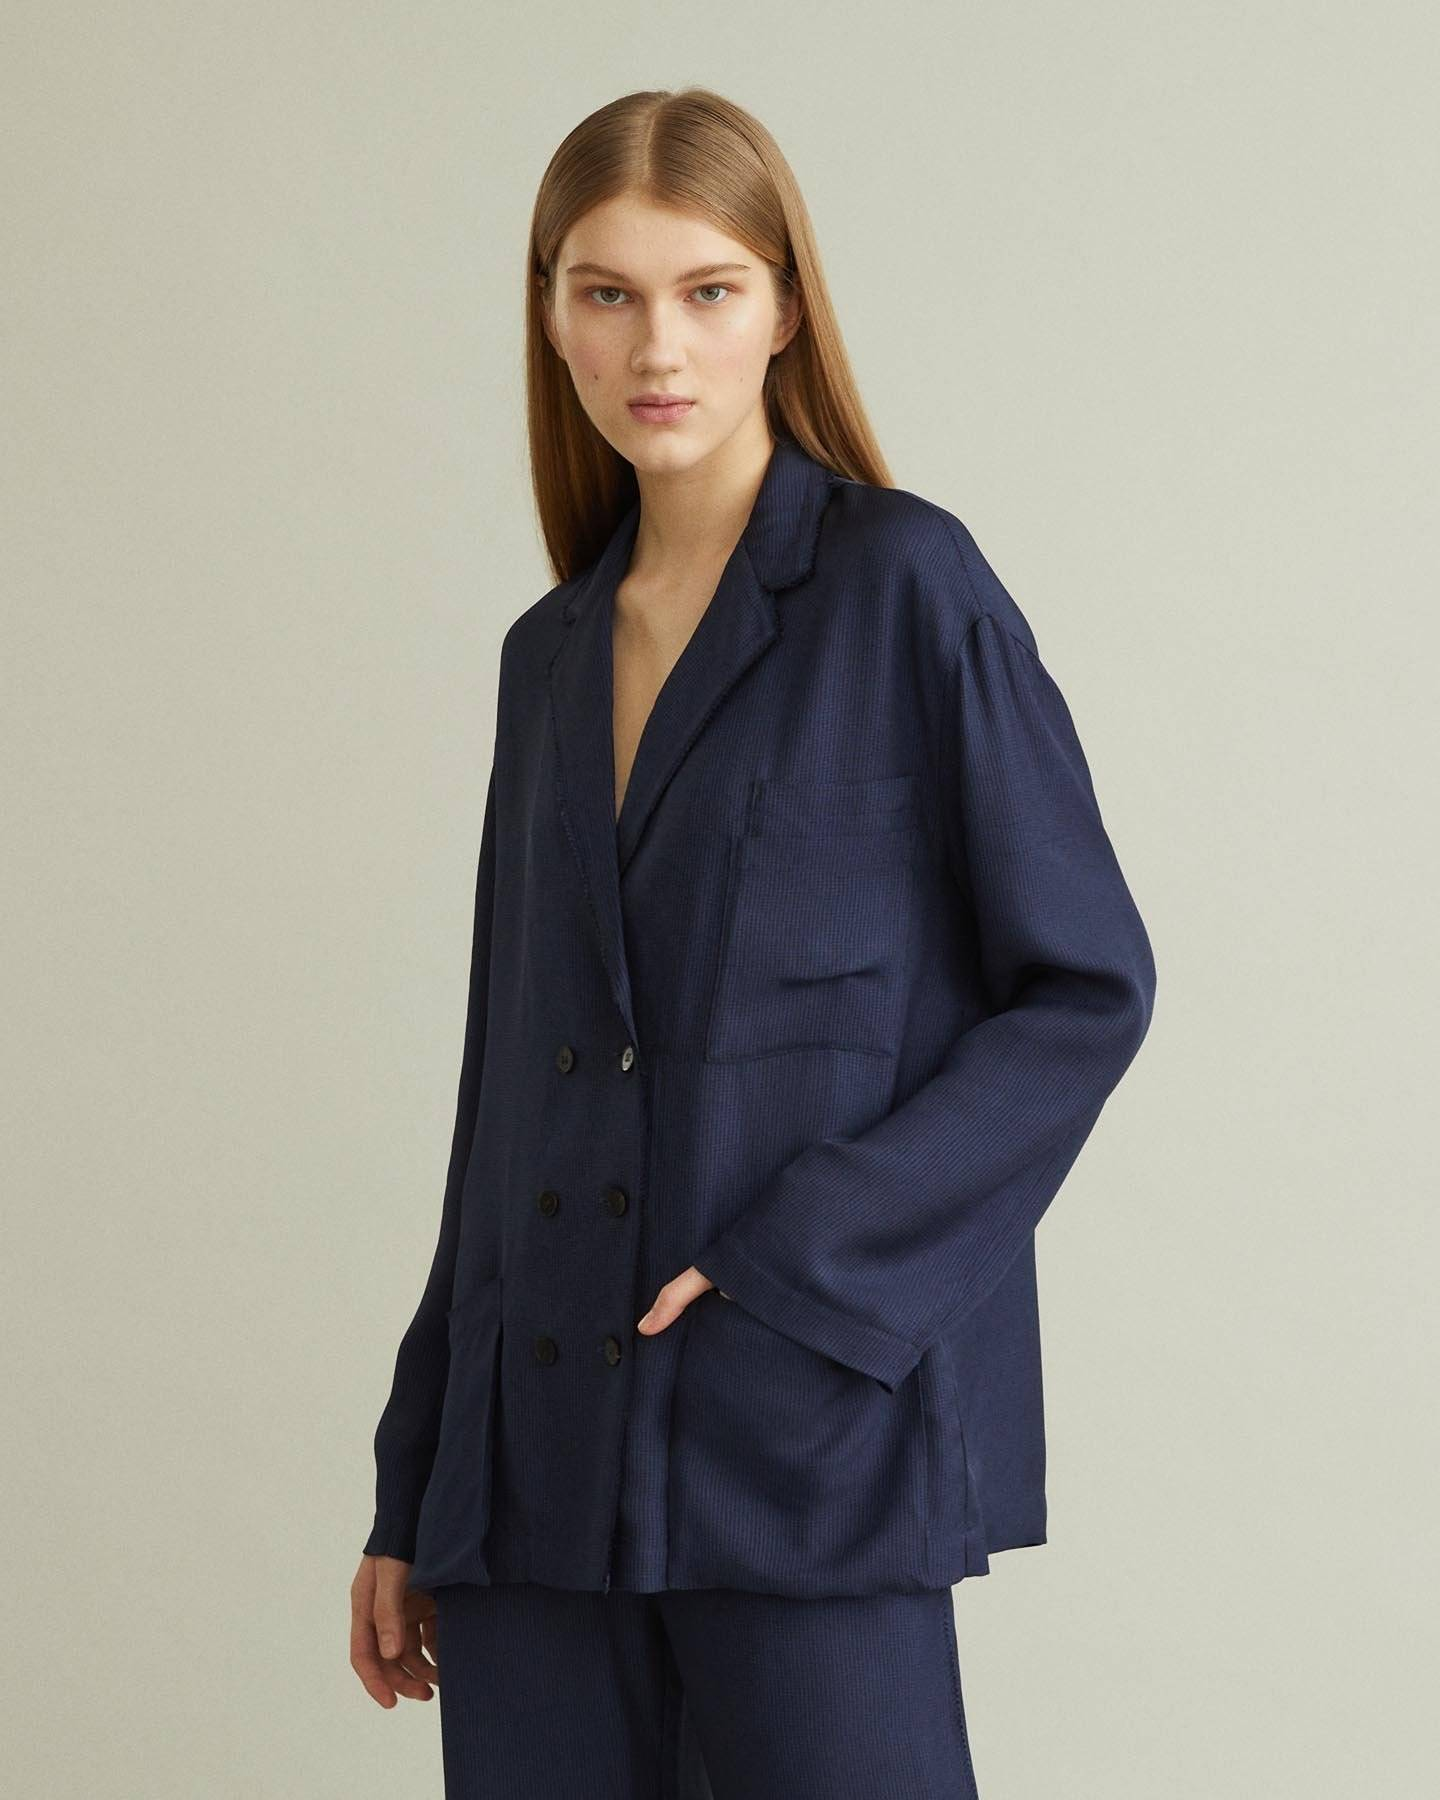 /products/sumi-fluid-suit-jacket